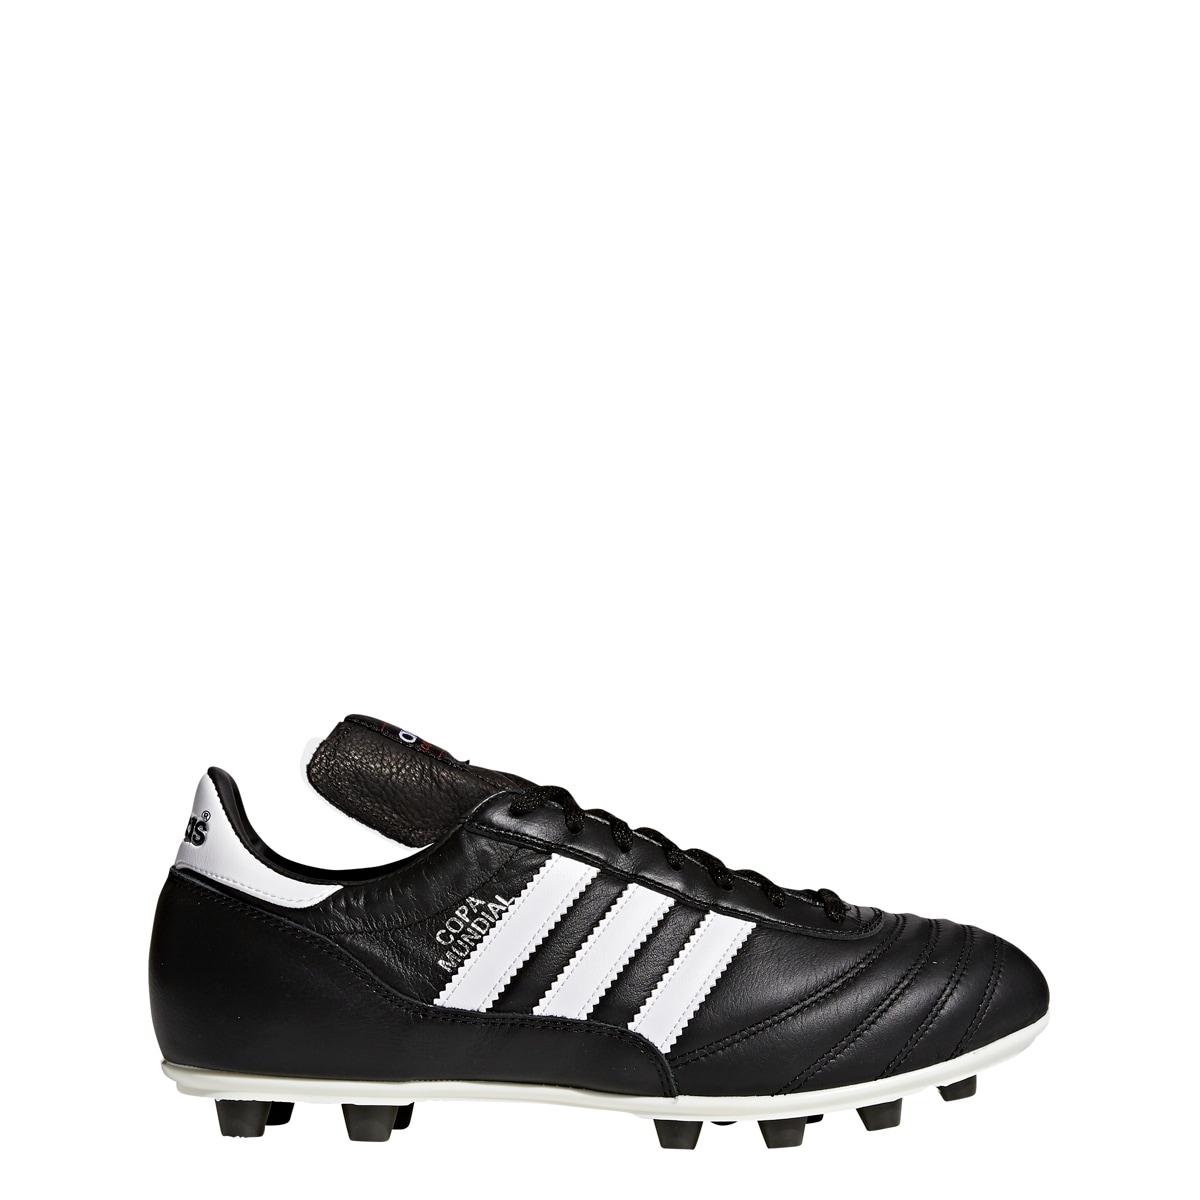 save off b5e0a c8f9e Adidas Performance Men s Copa Mundial Soccer Shoe